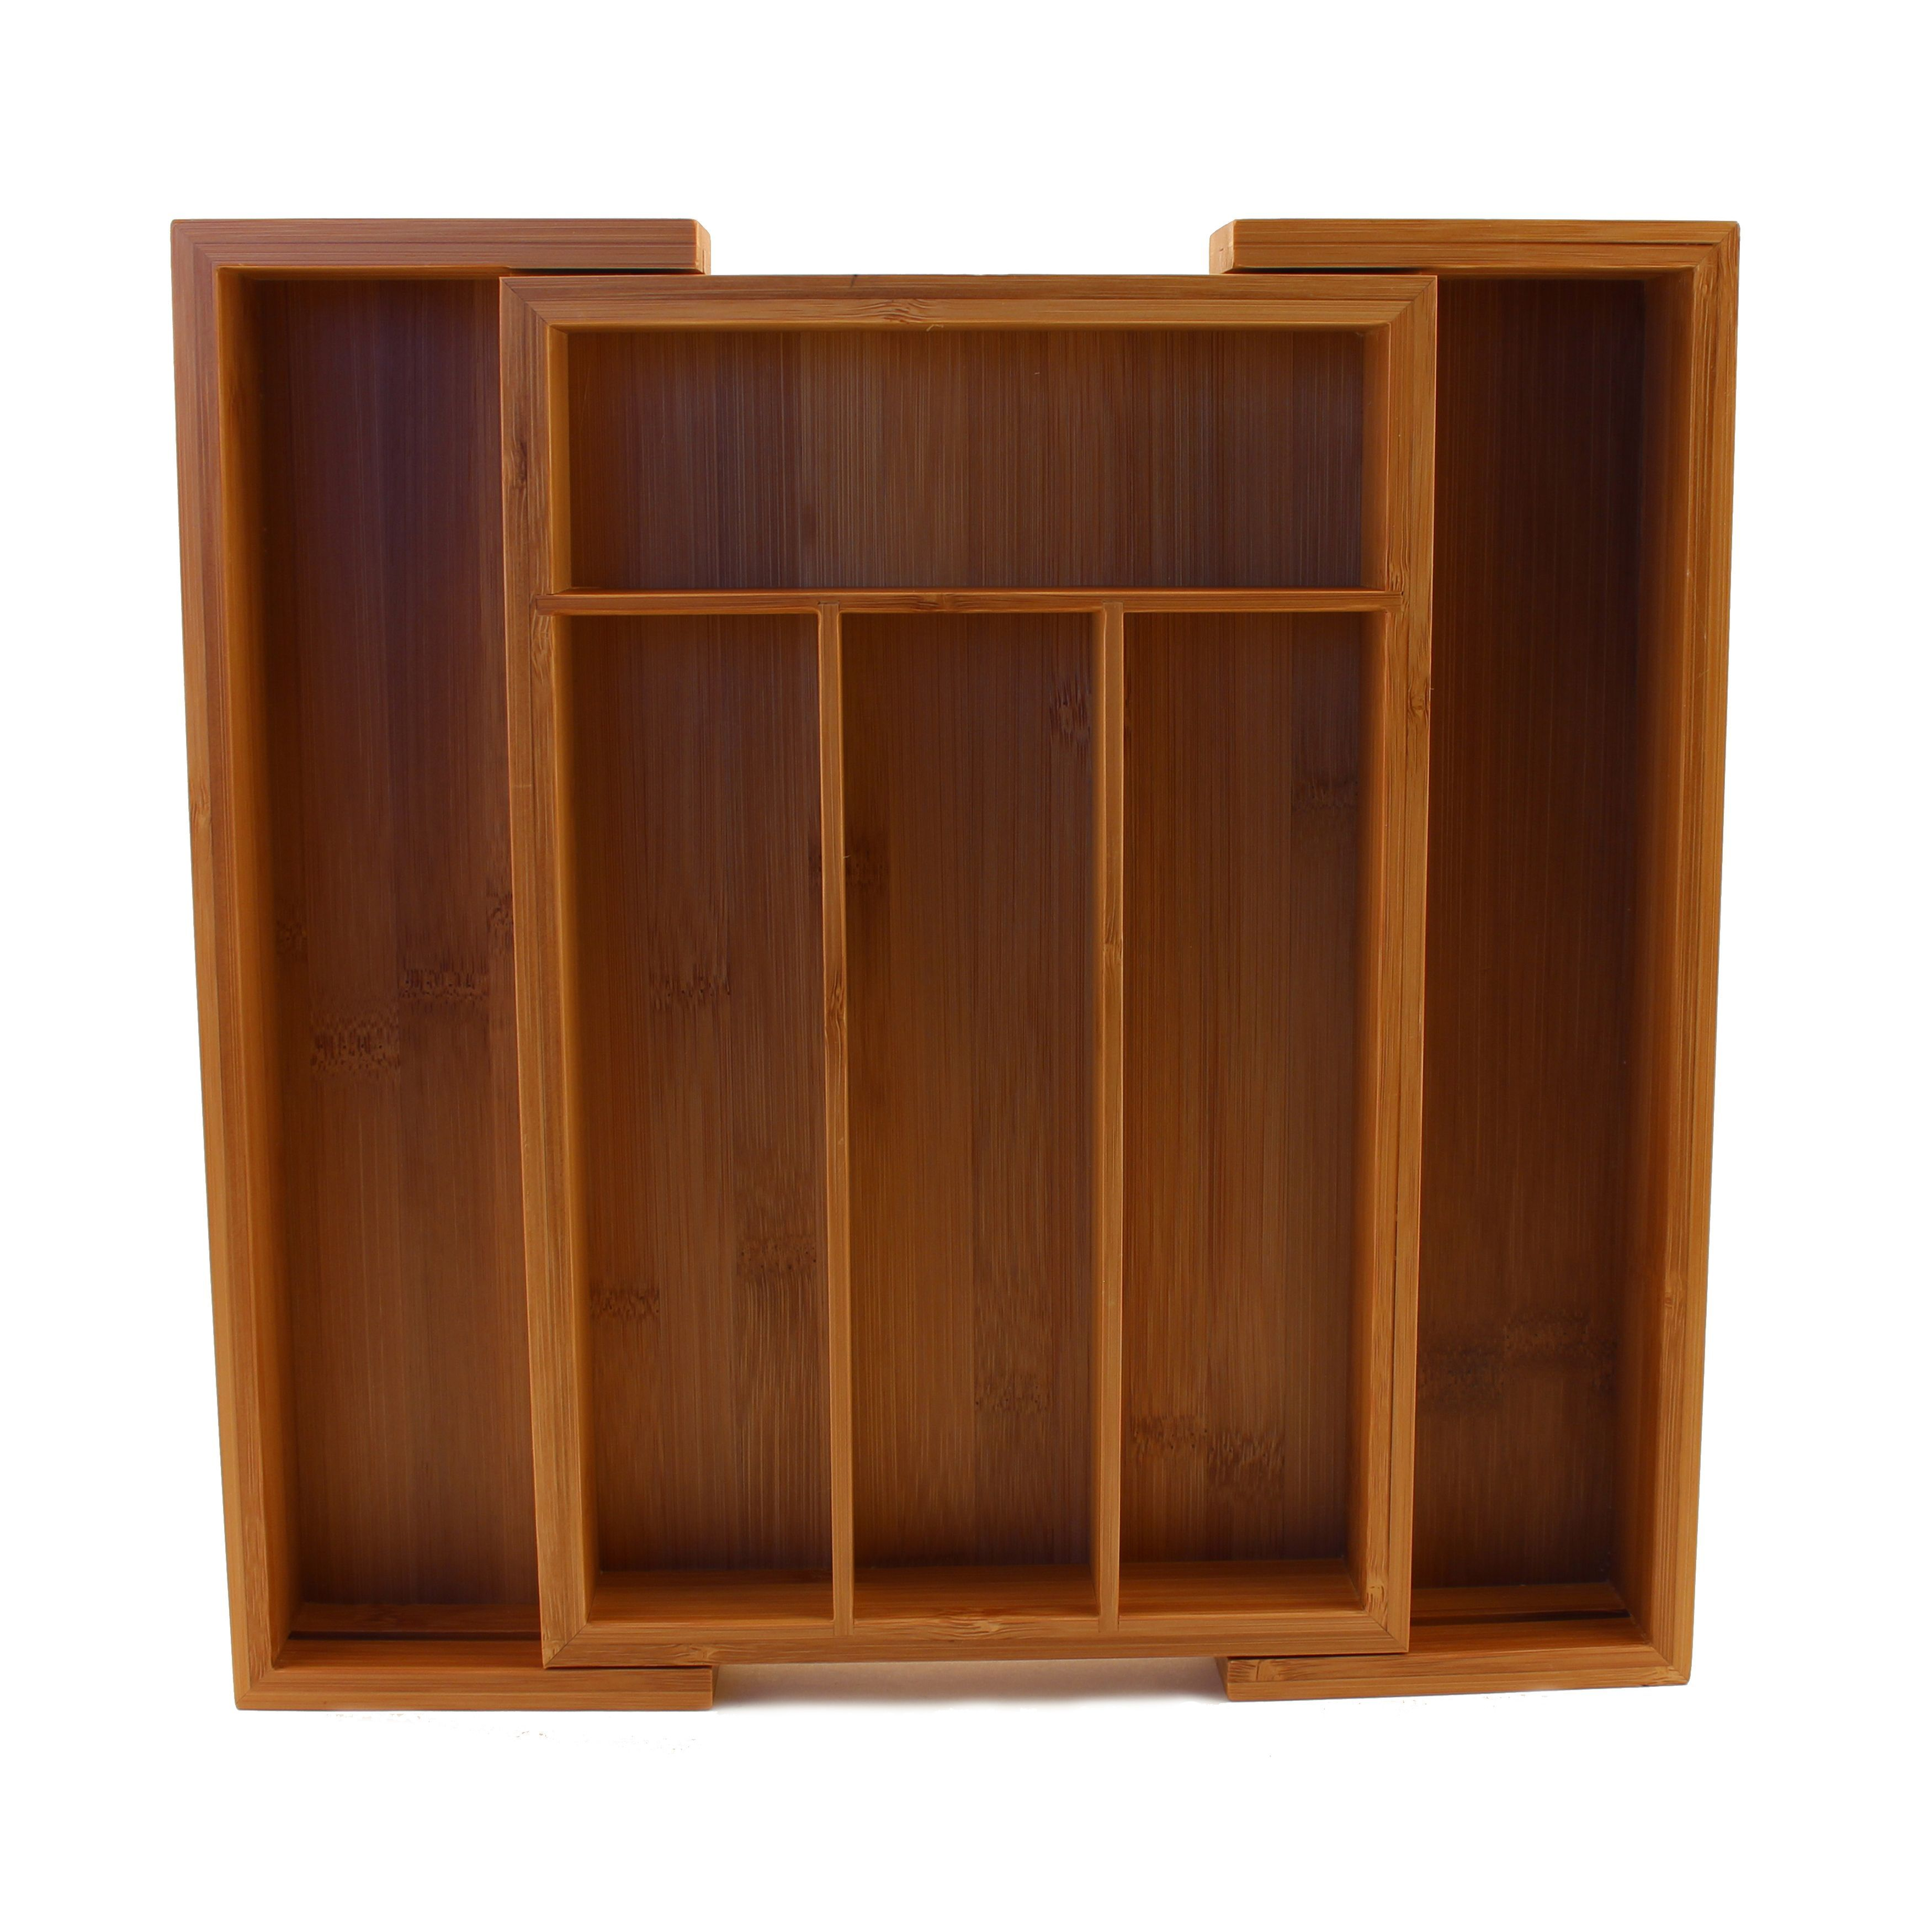 BergHOFF Cook N\' Co 6-slot Expanding Flatware Organizer (Bamboo ...